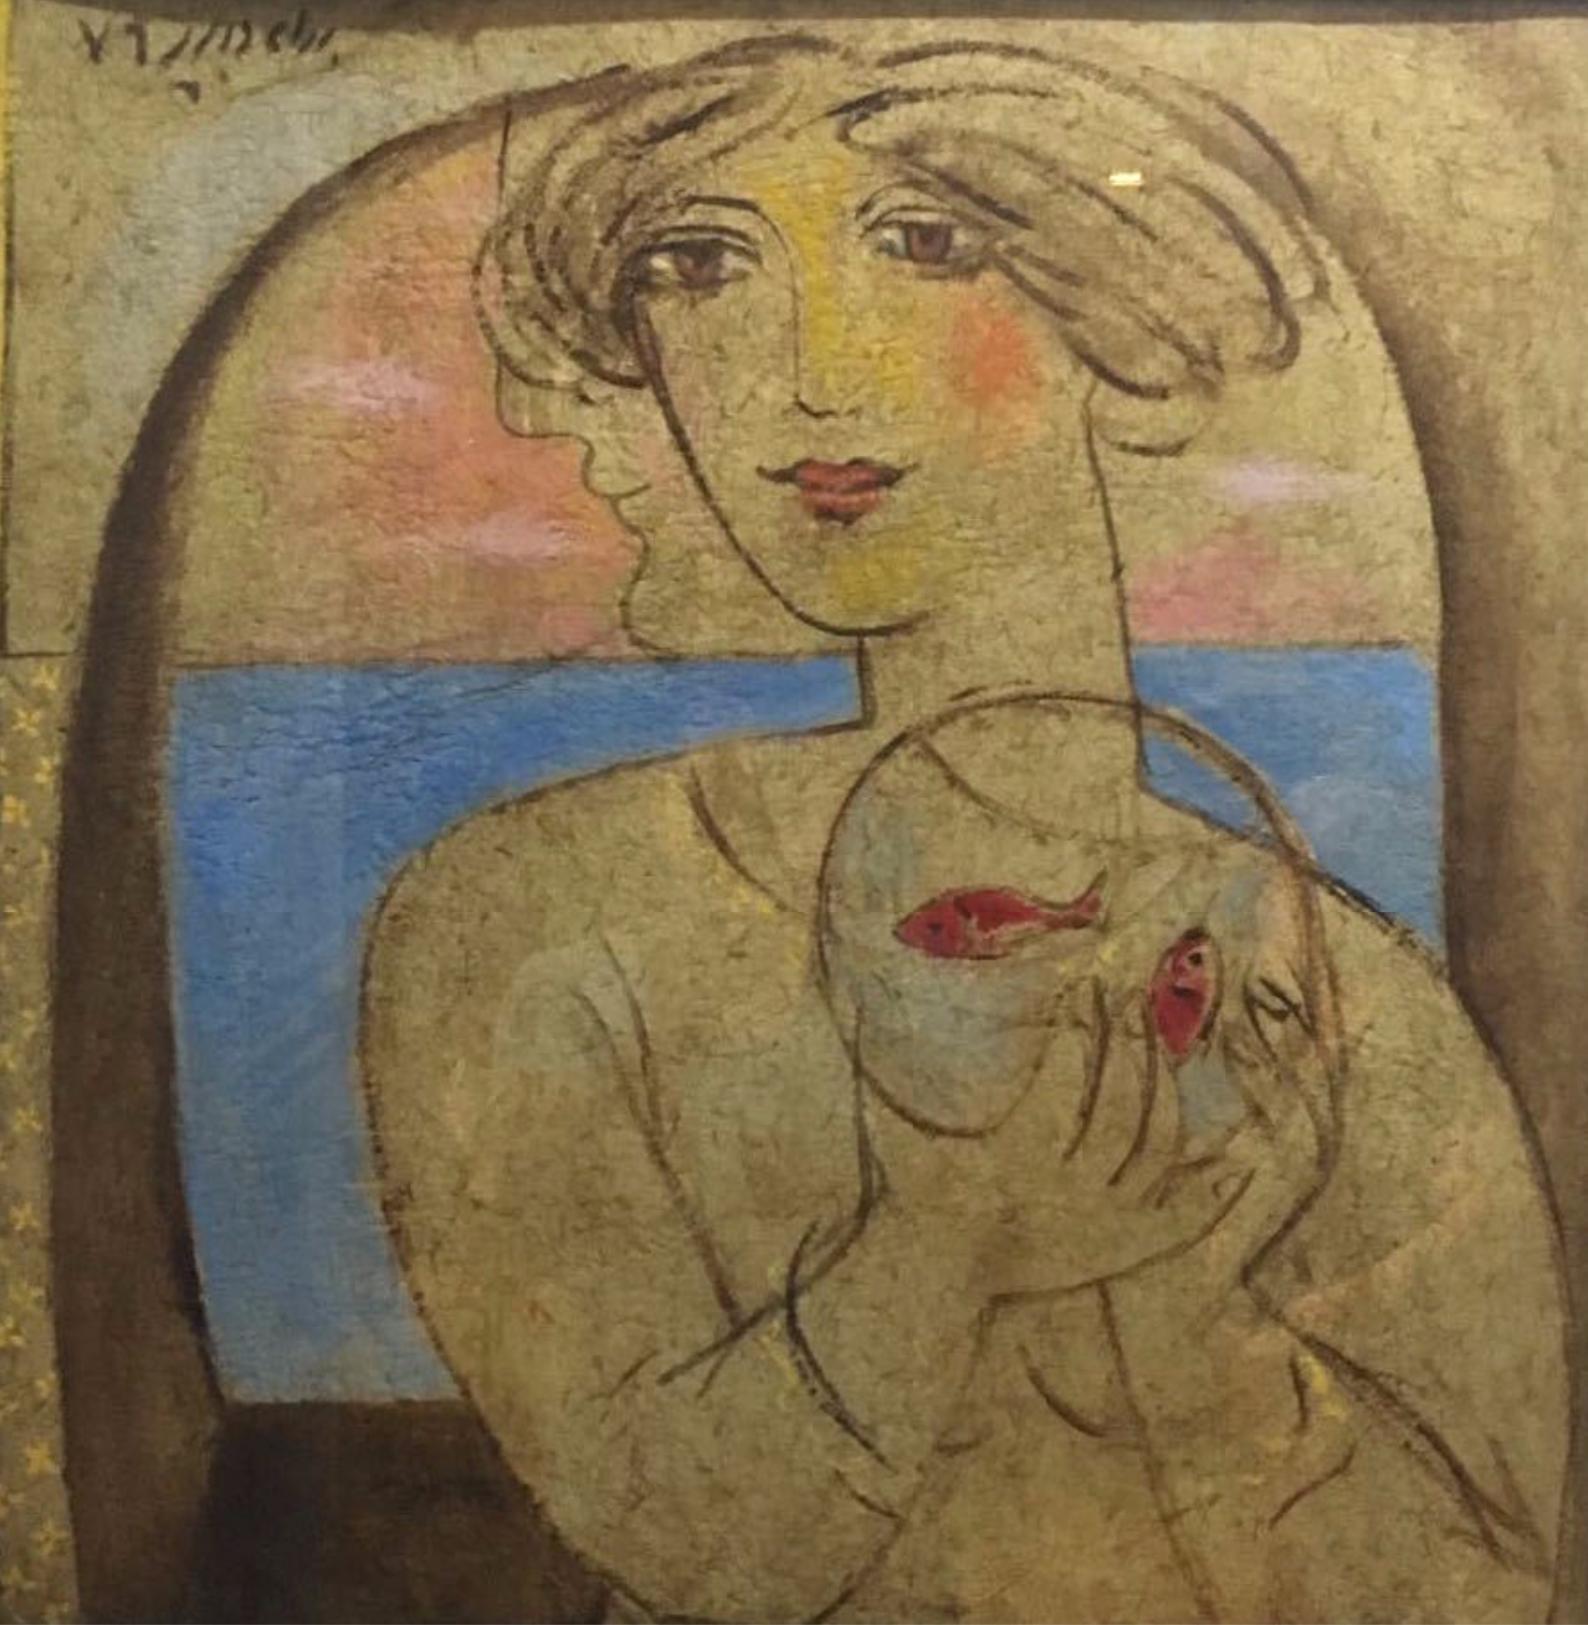 Bahram Dabiri, Untitled, mixed media on canvas, 1996